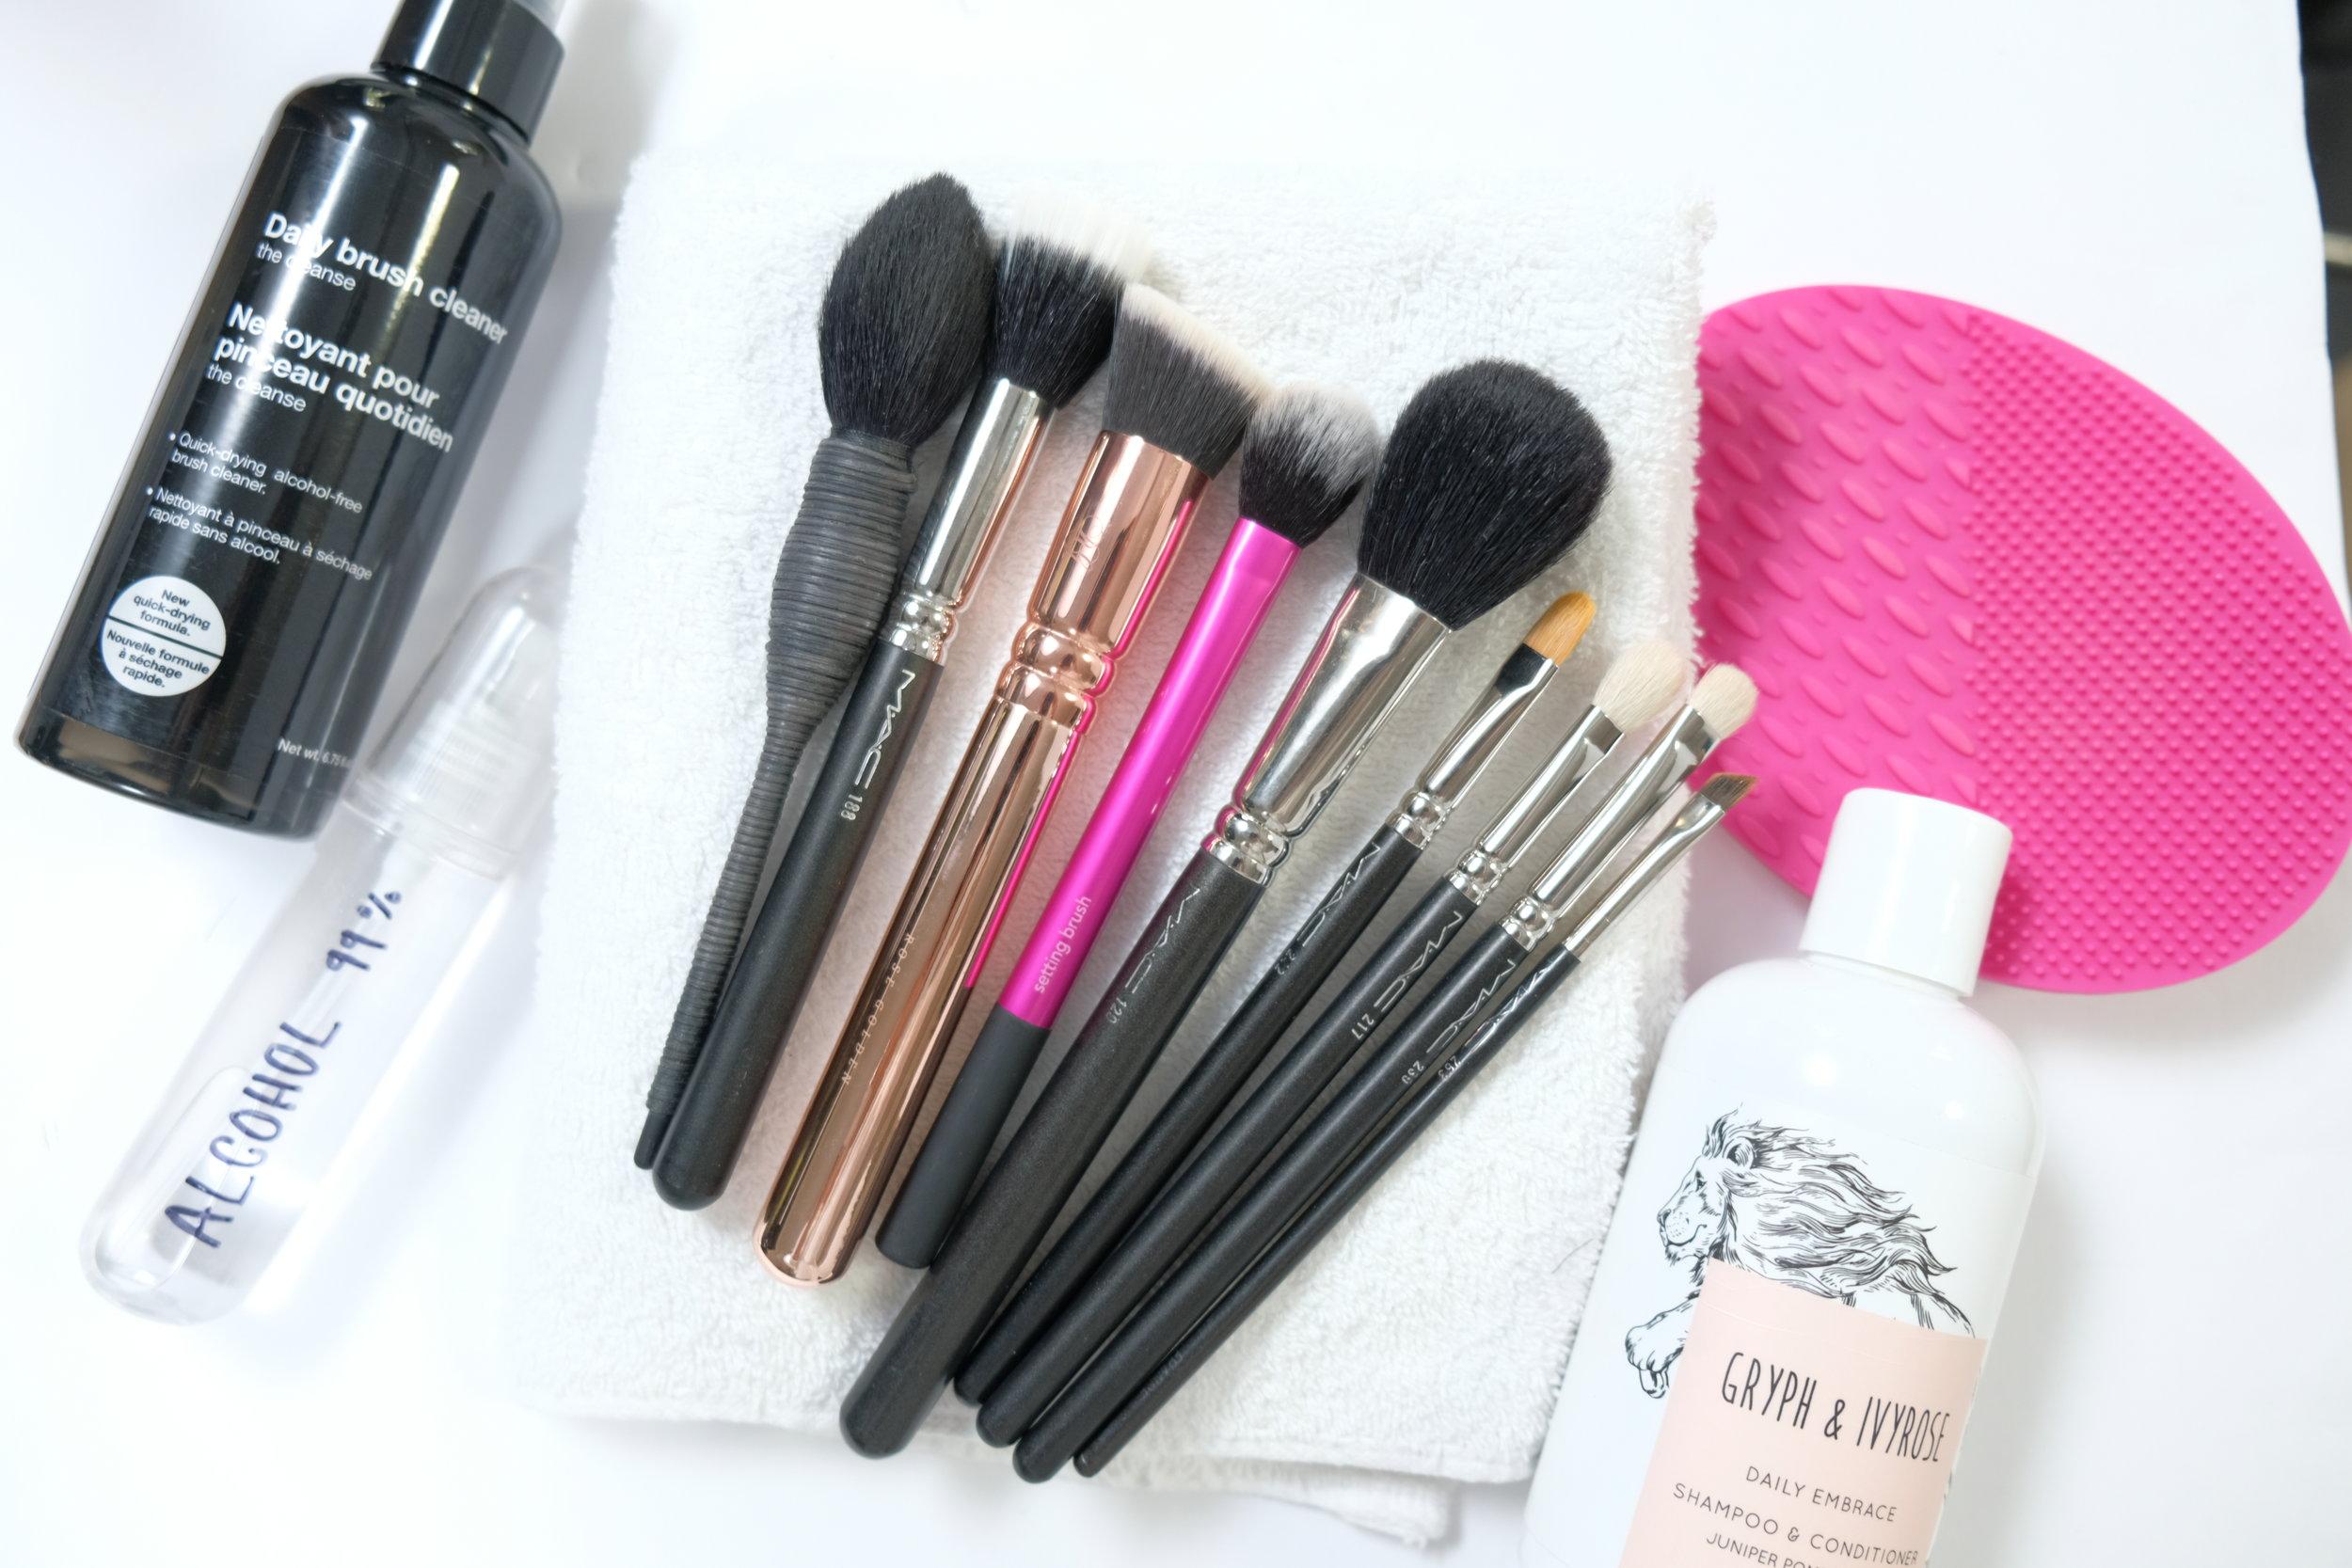 VIDEO: Makeup Brushes My Makeup Artist  & I Use